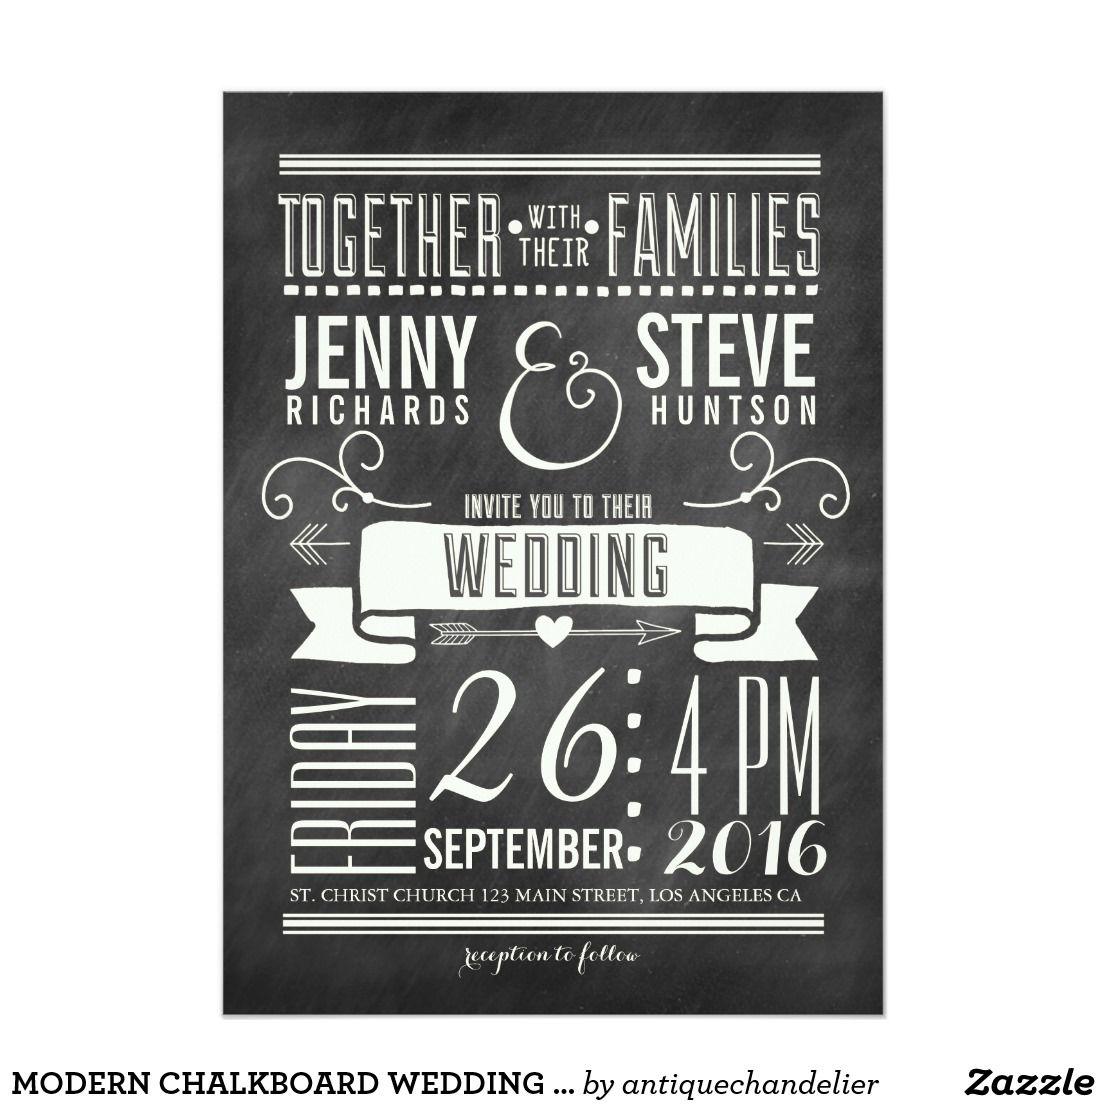 modern chalkboard wedding invitation  shabby chic modern and rustic - modern chalkboard wedding invitation